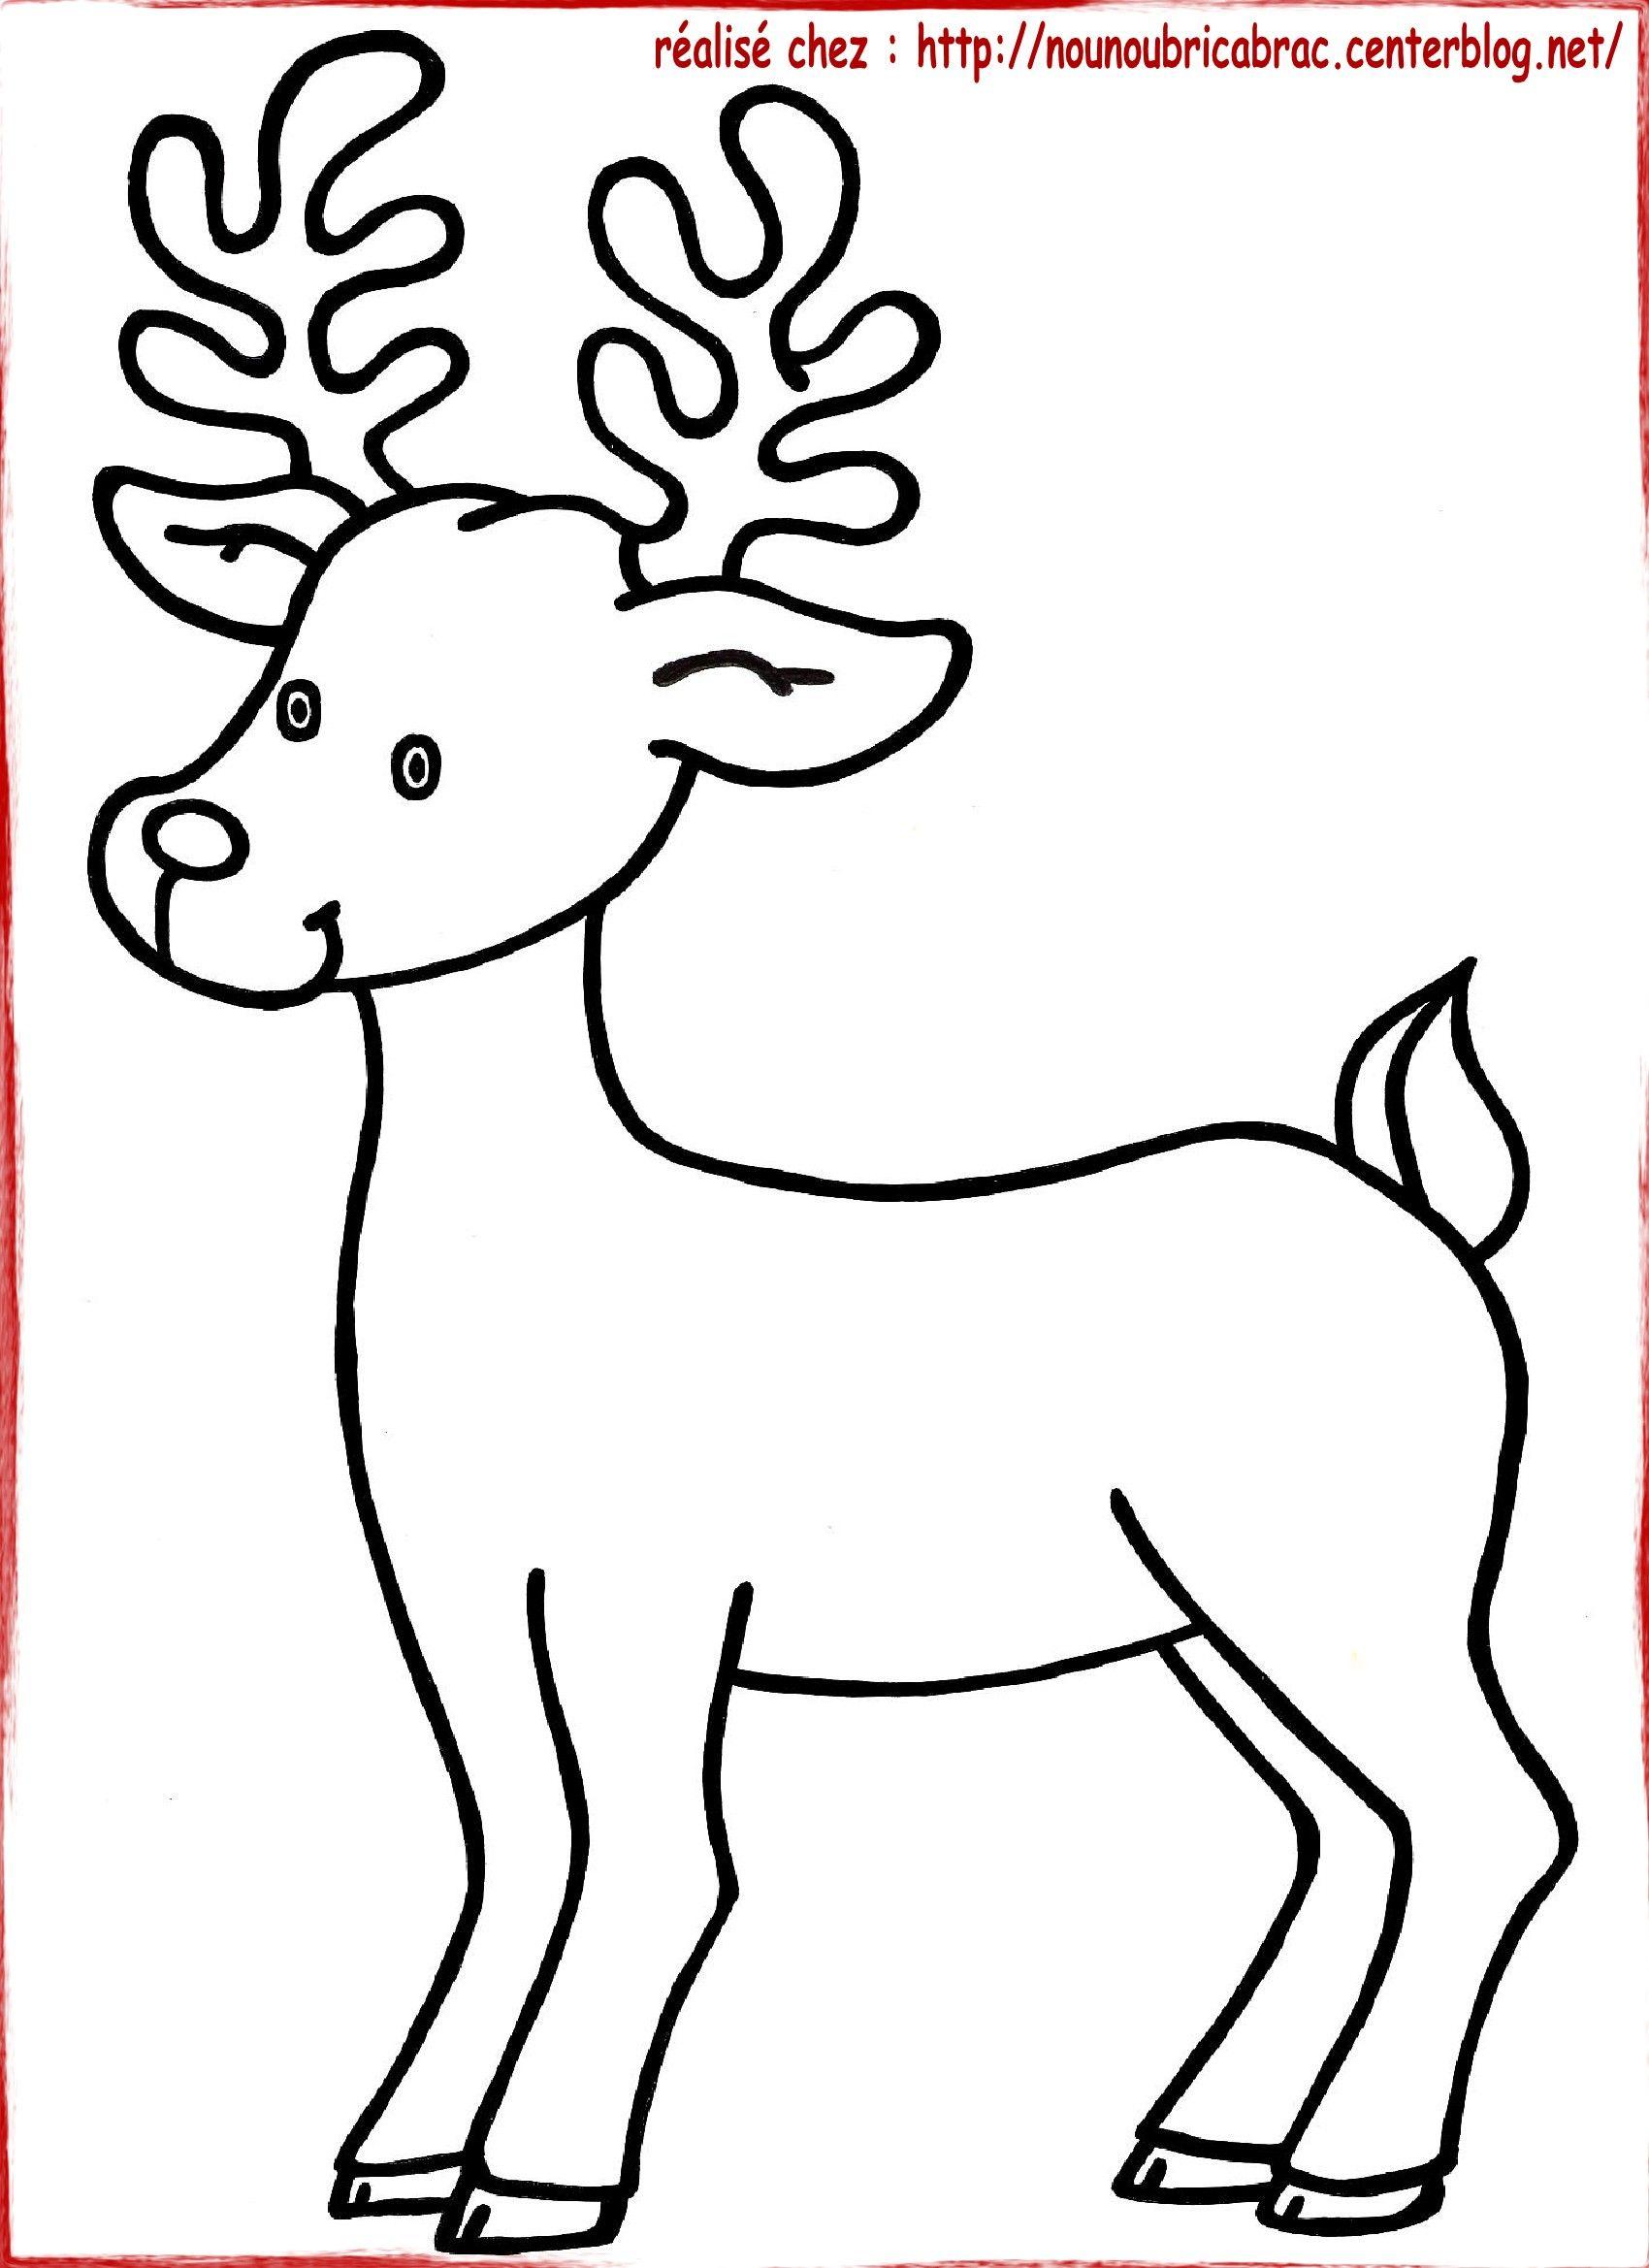 rene du pere noel dessin recherche google christmas coloring pages pinterest noel. Black Bedroom Furniture Sets. Home Design Ideas